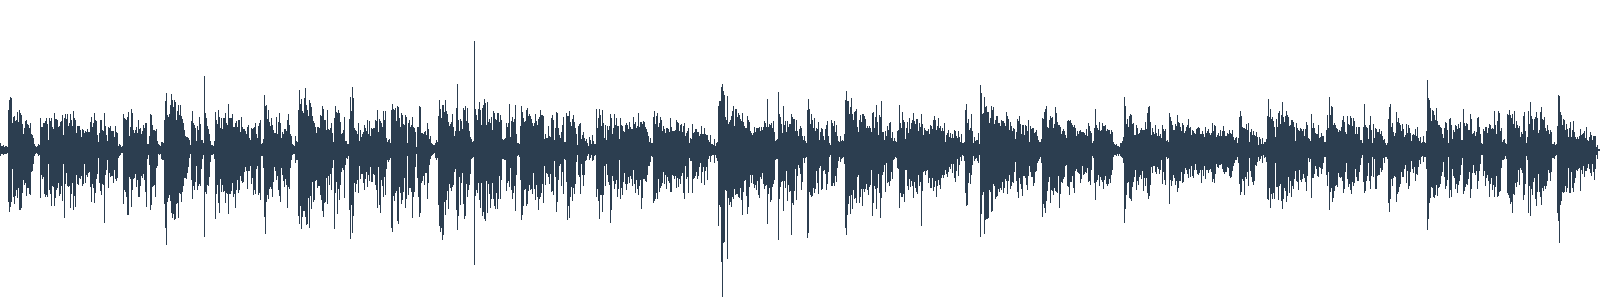 Nové audioknihy 31-32/2019 waveform